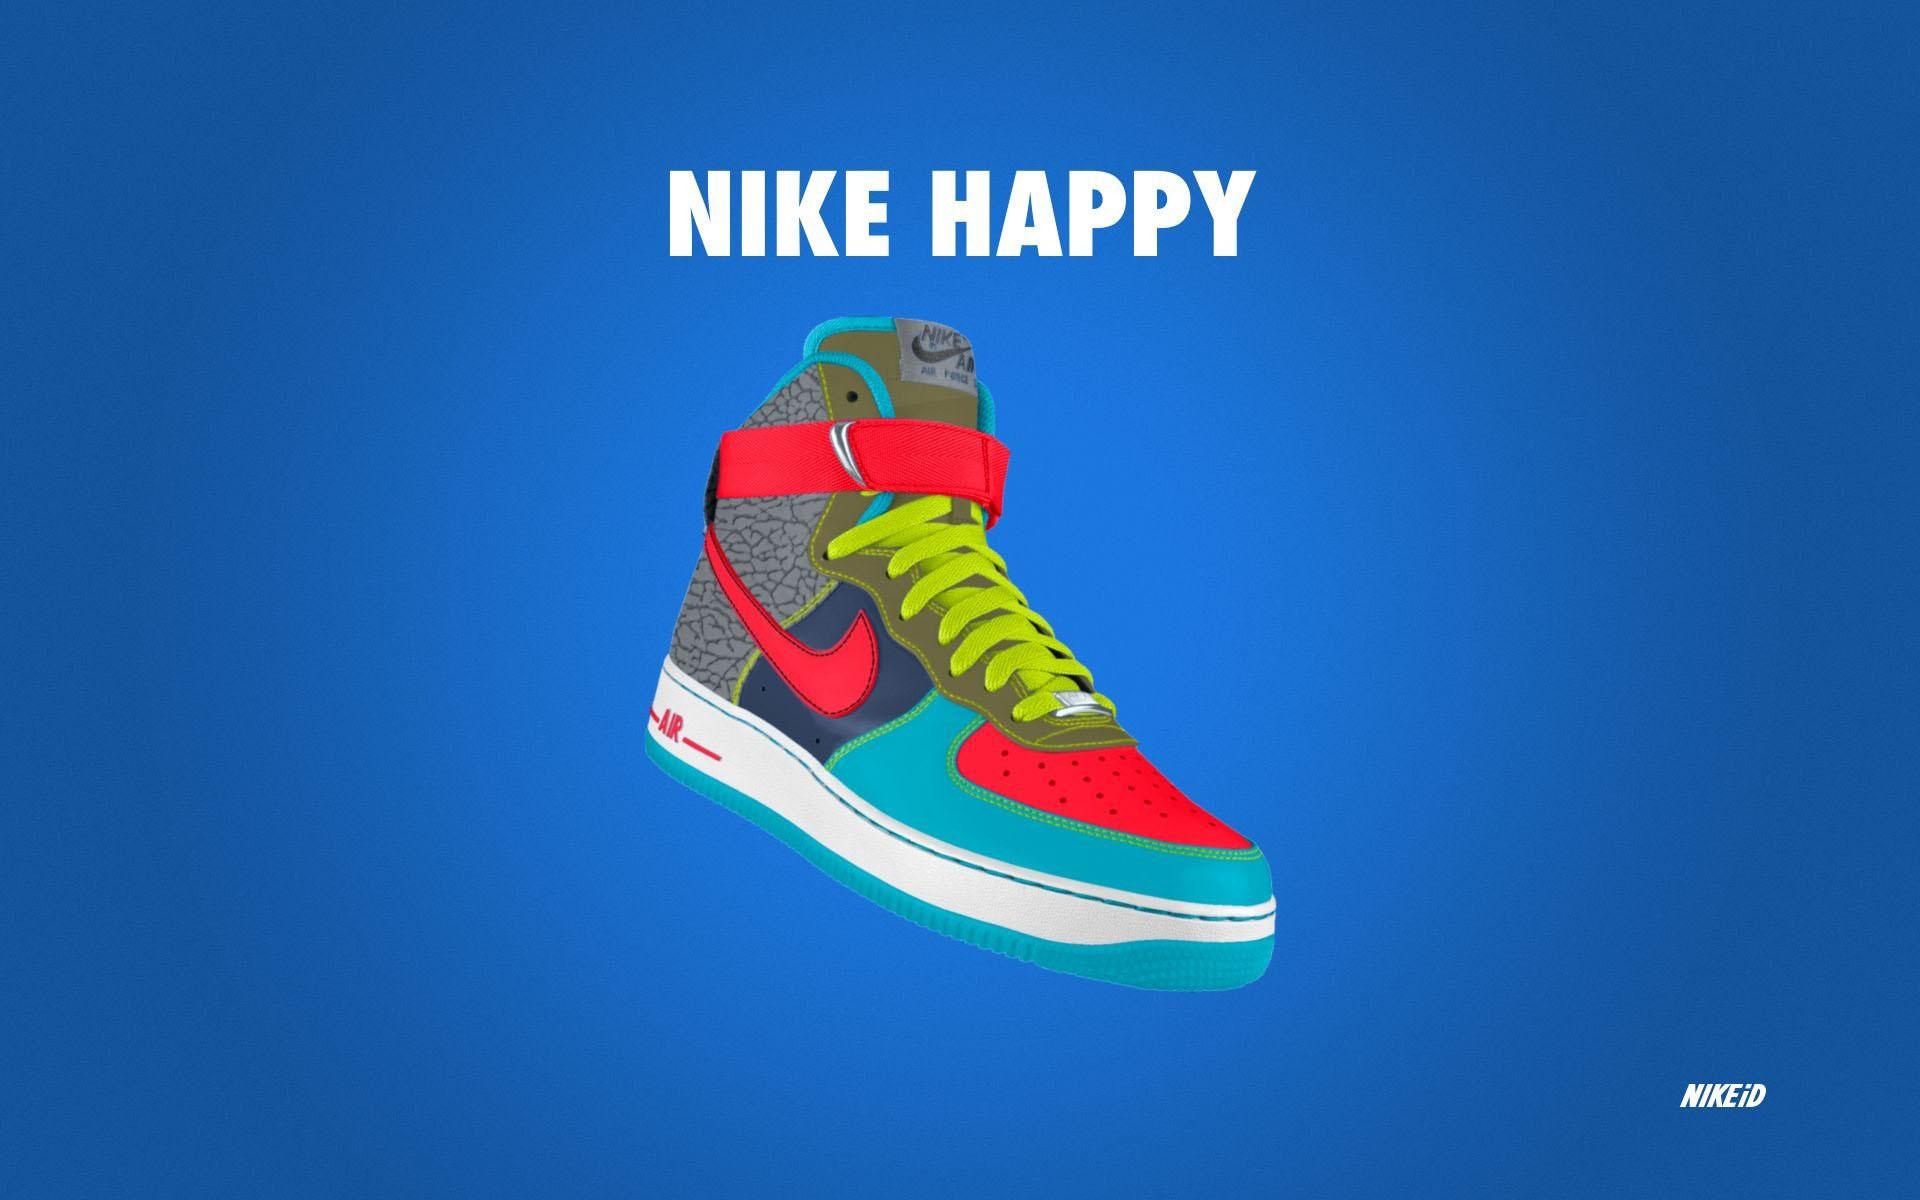 Nike Ipad Wallpaper